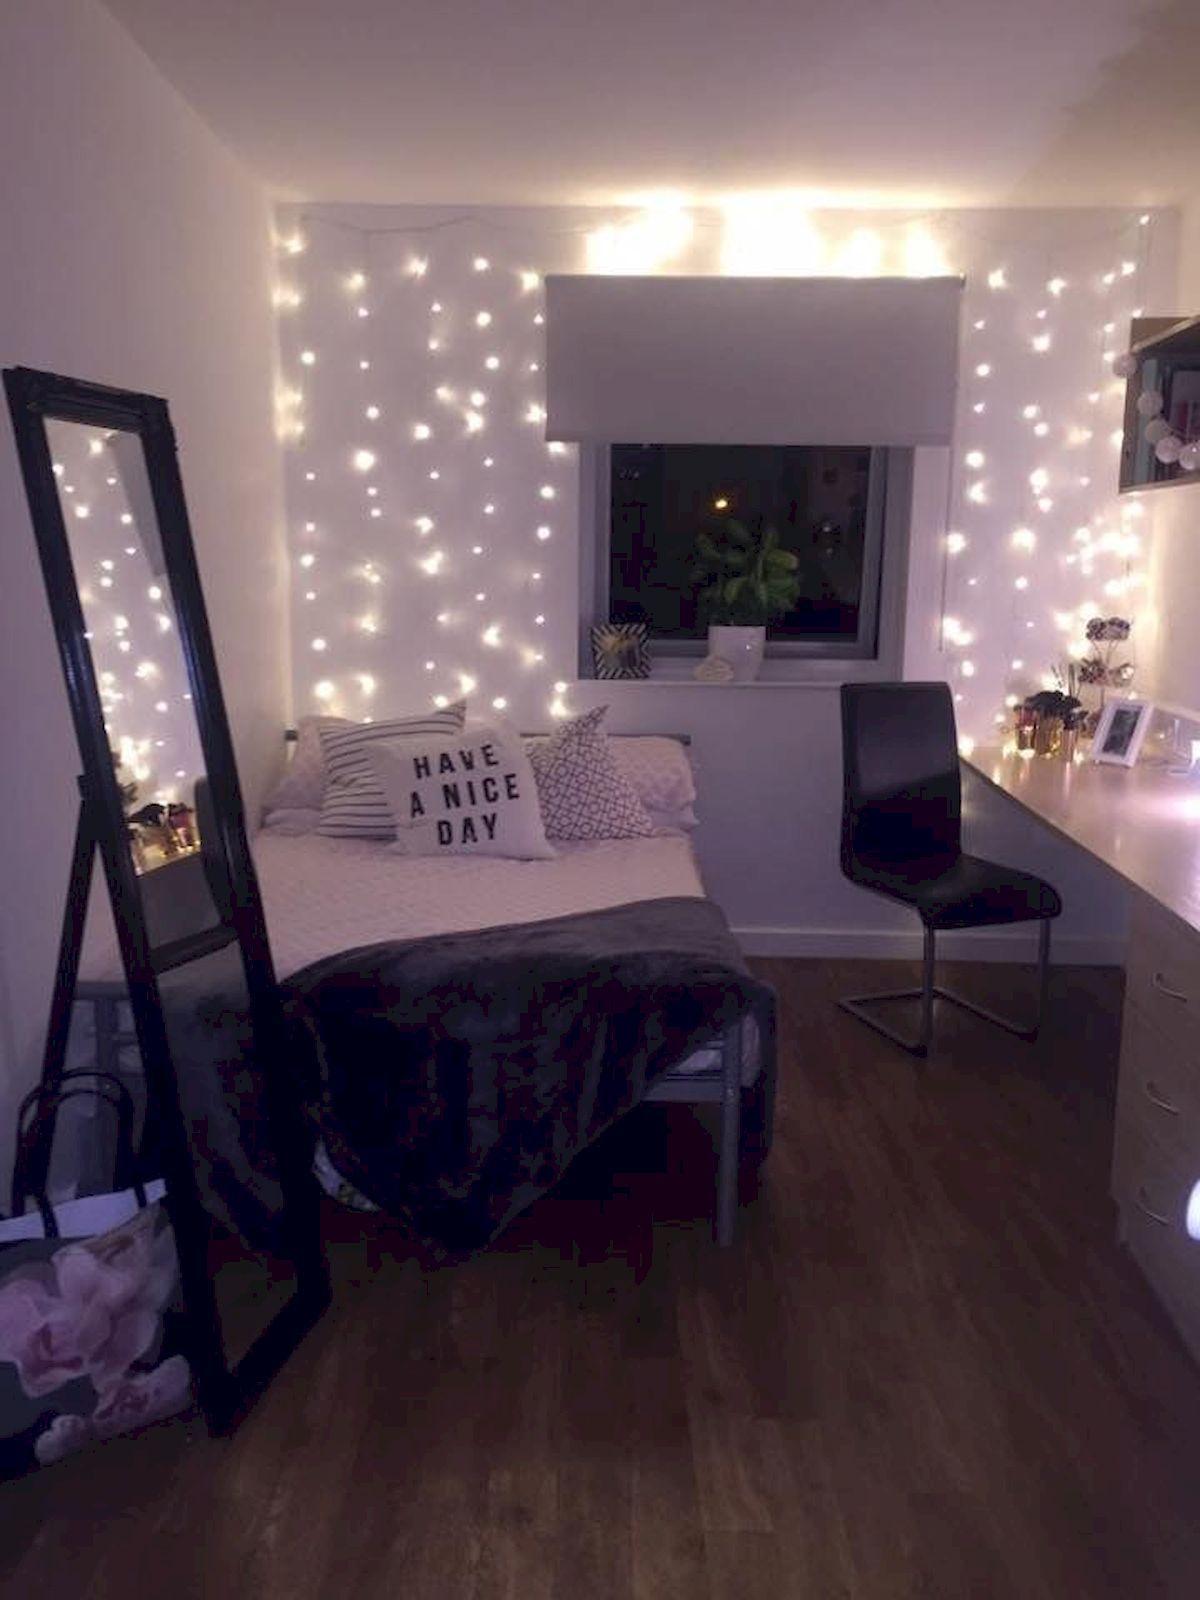 Teenage Girls Bedroom Ideas | Room decor, Bedroom decor ... on Trendy Teenage Room Decor  id=58220